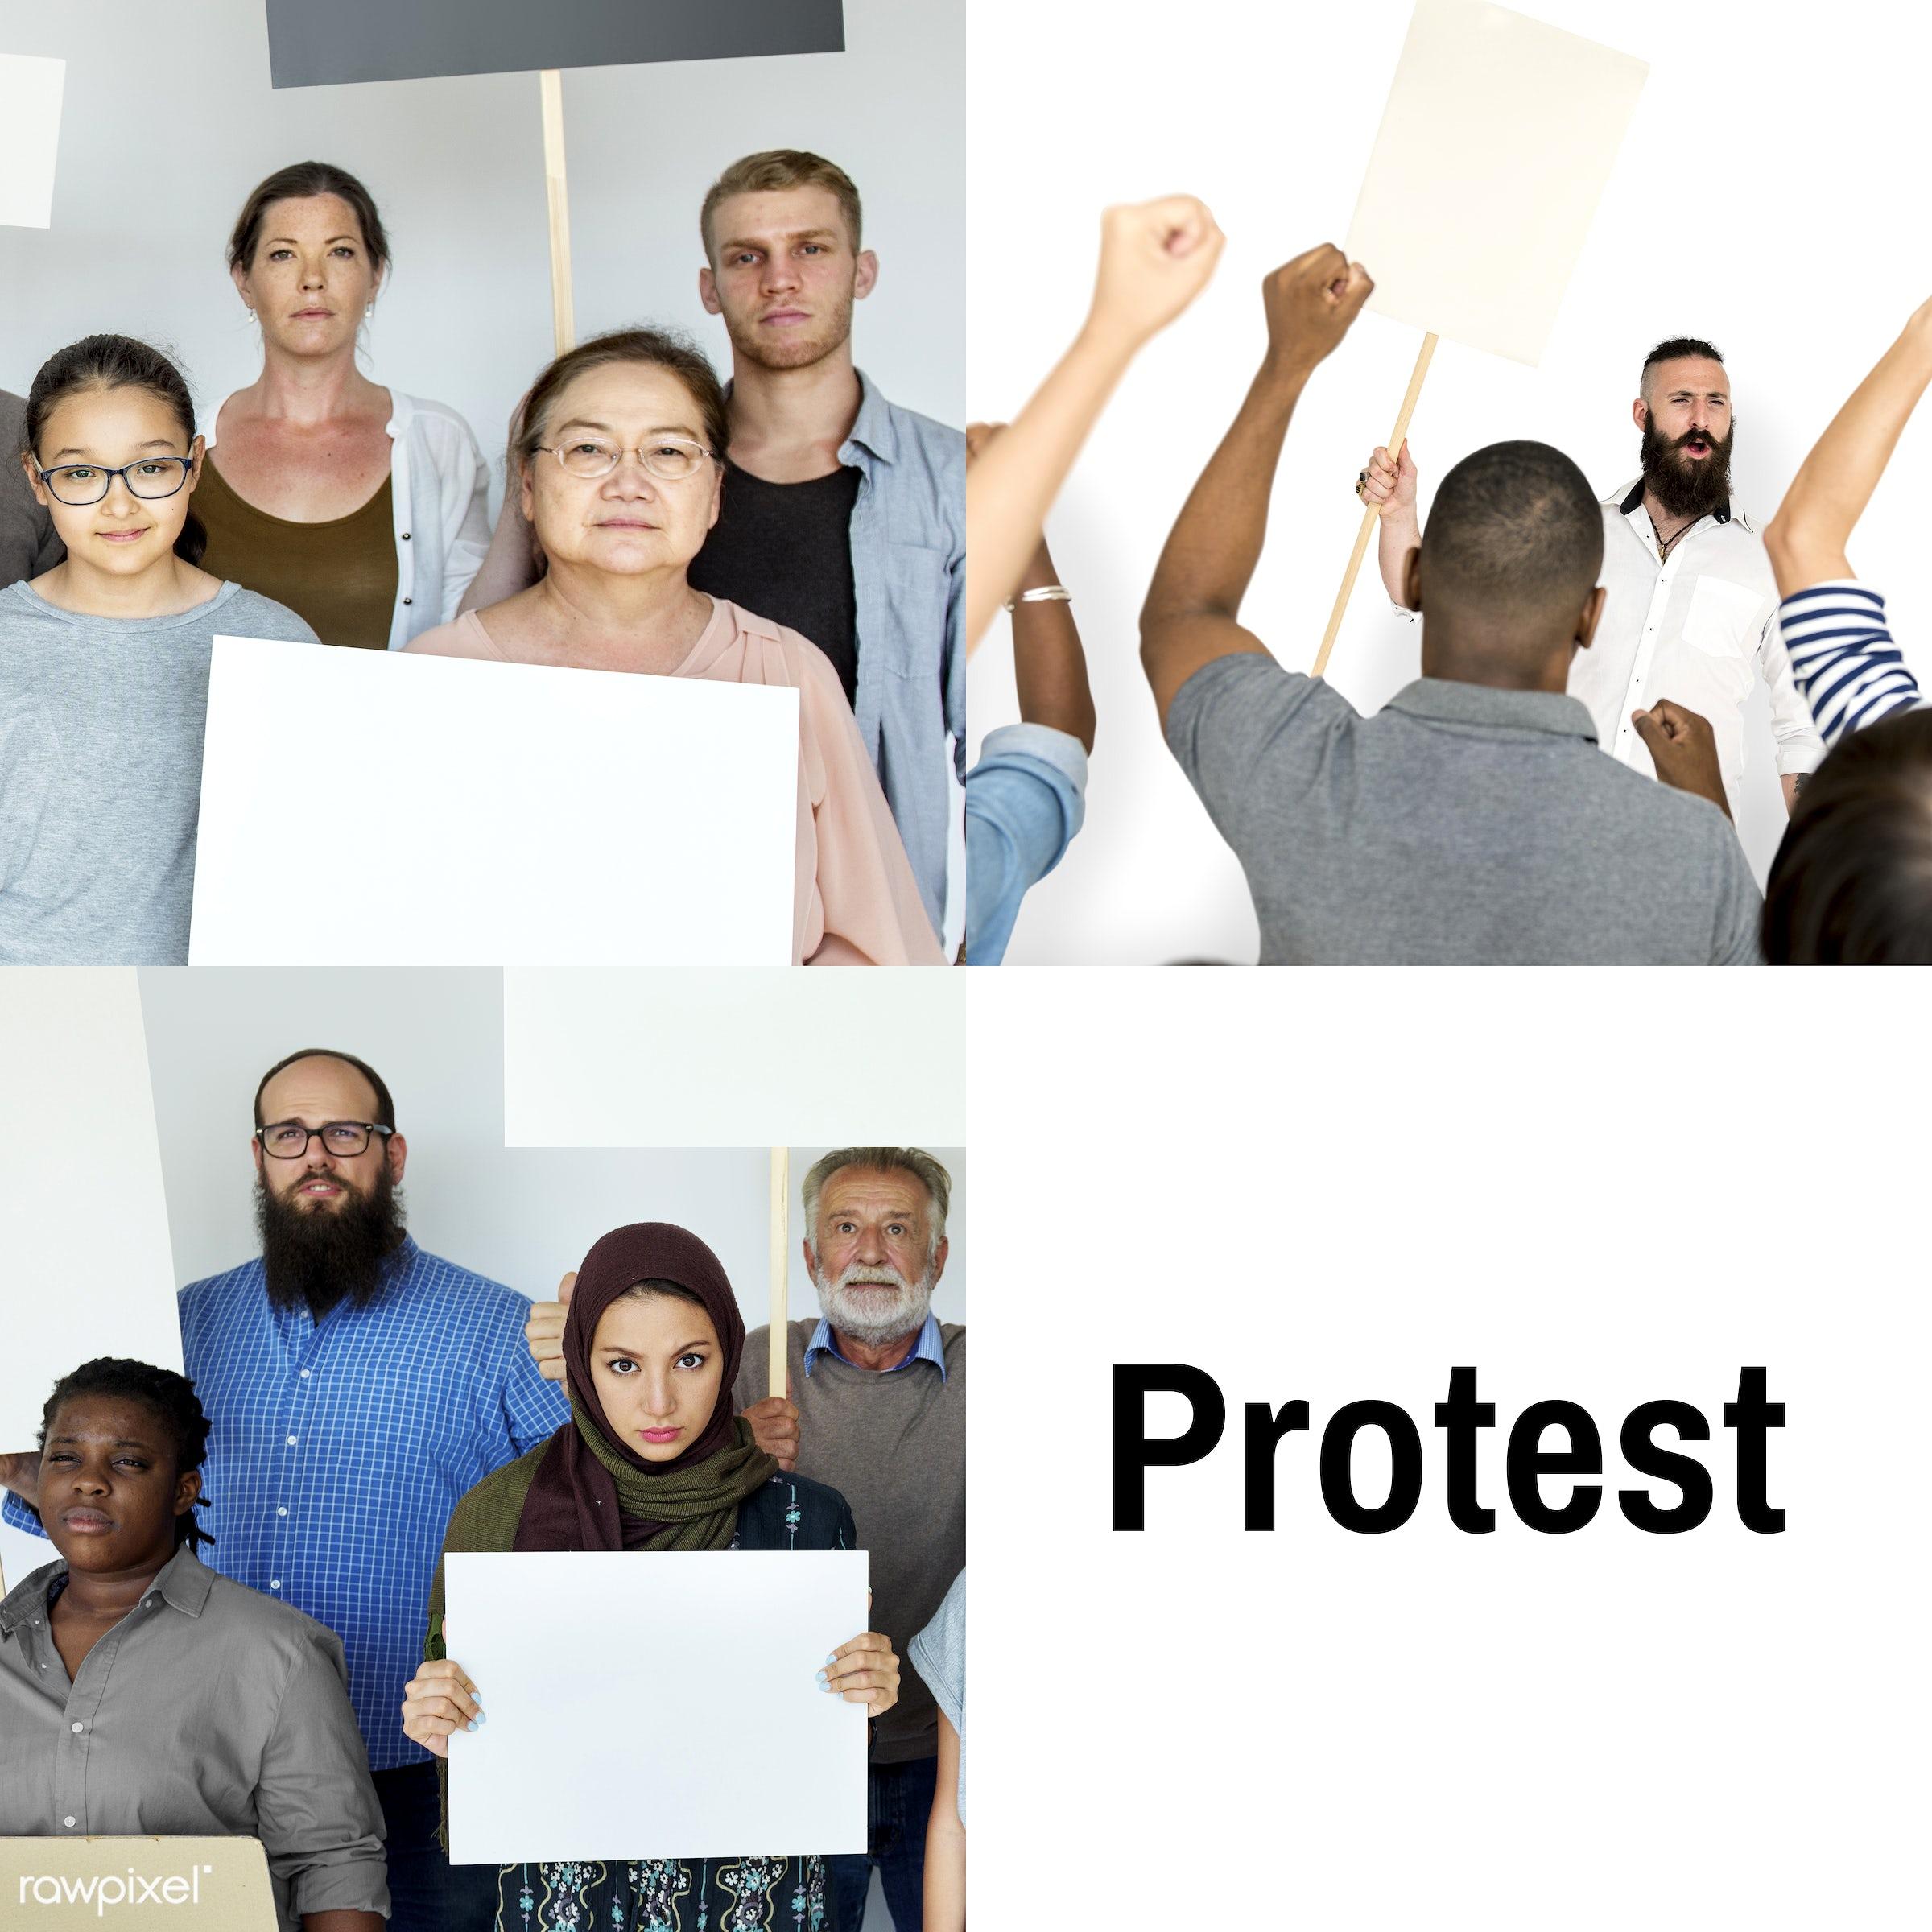 different, diverse, protest, variation, object, people, race, integration, disapproval, gender, refusal, complaint, revolt,...